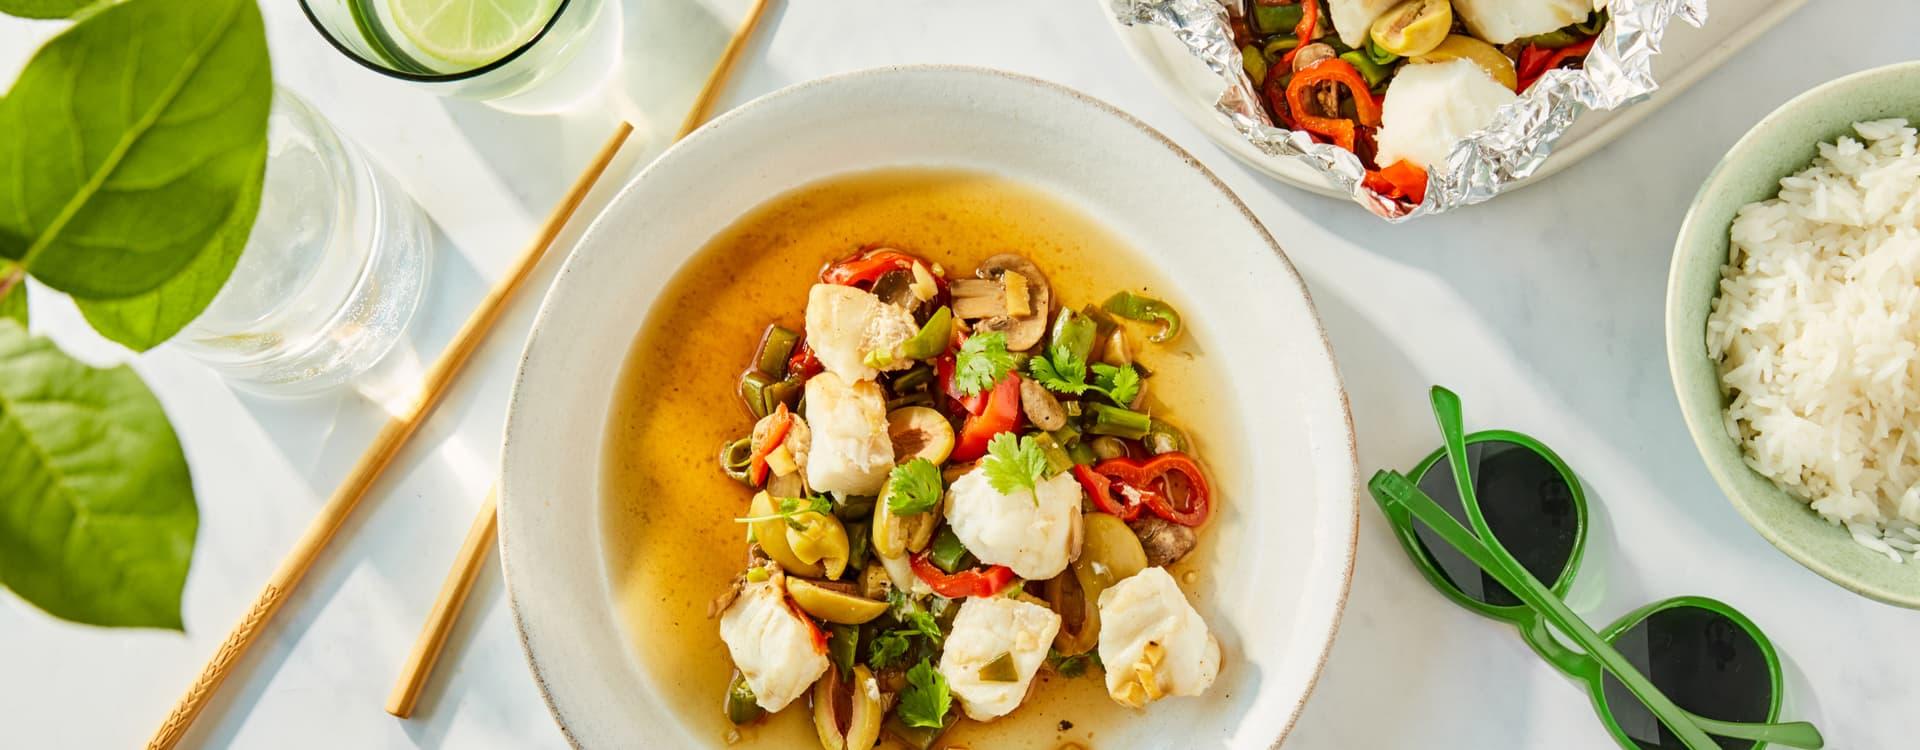 Asiatisk torsk med grønnsaker